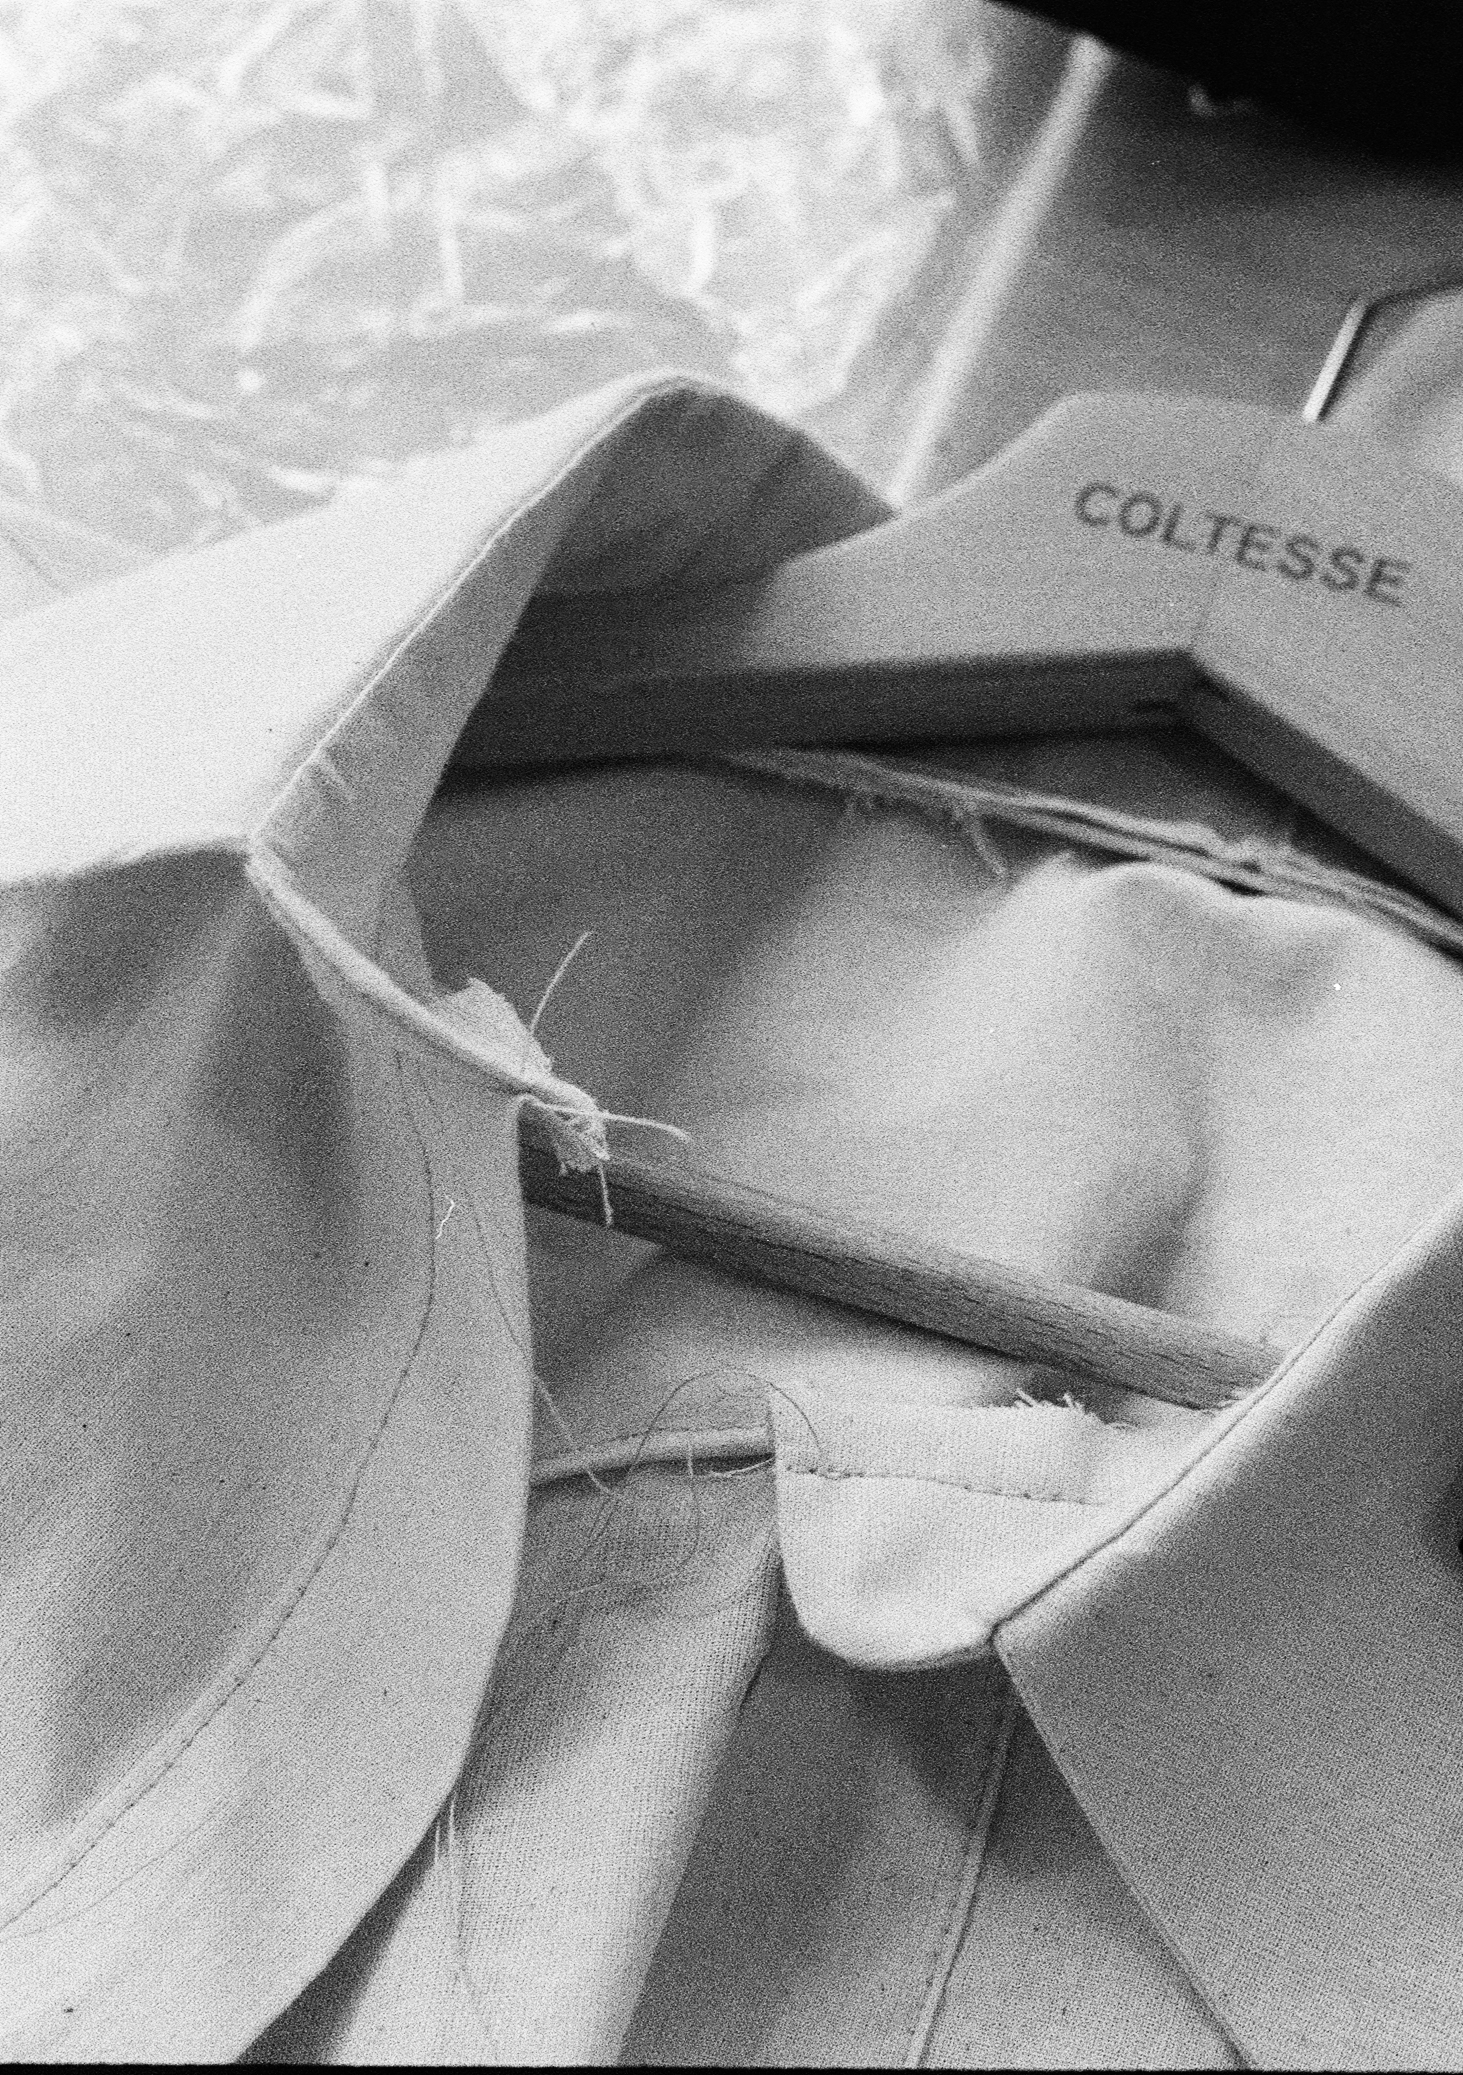 COLTESSE-12.jpg